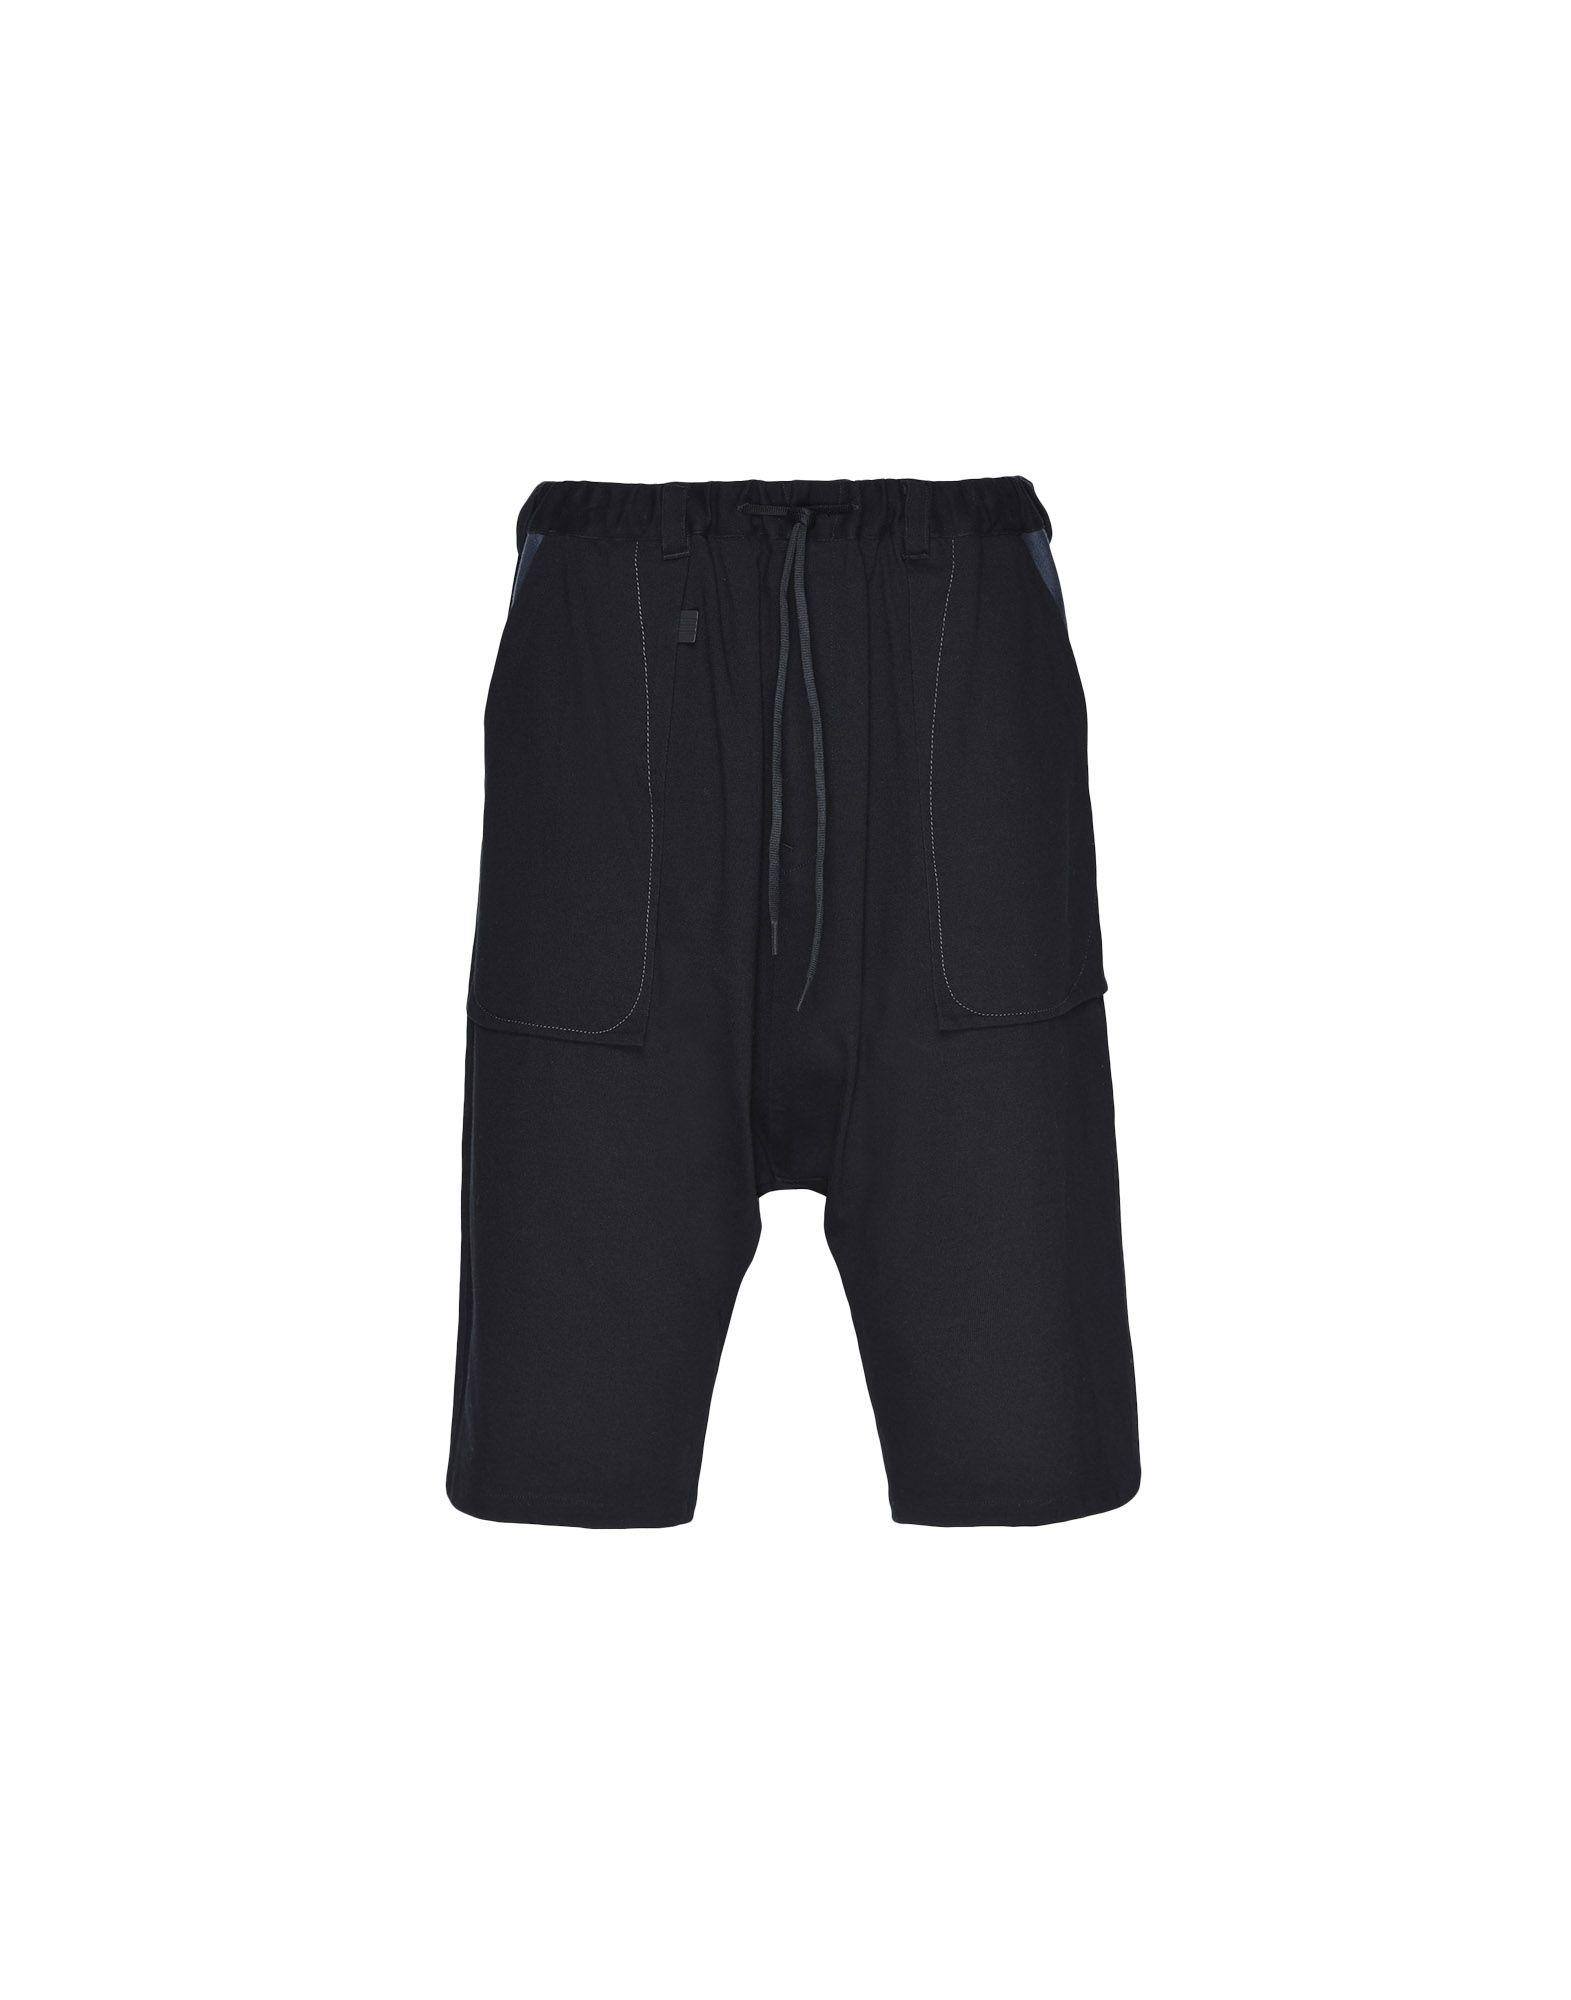 Y-3 Y-3 Sarouel Shorts Sport-Shorts Herren f